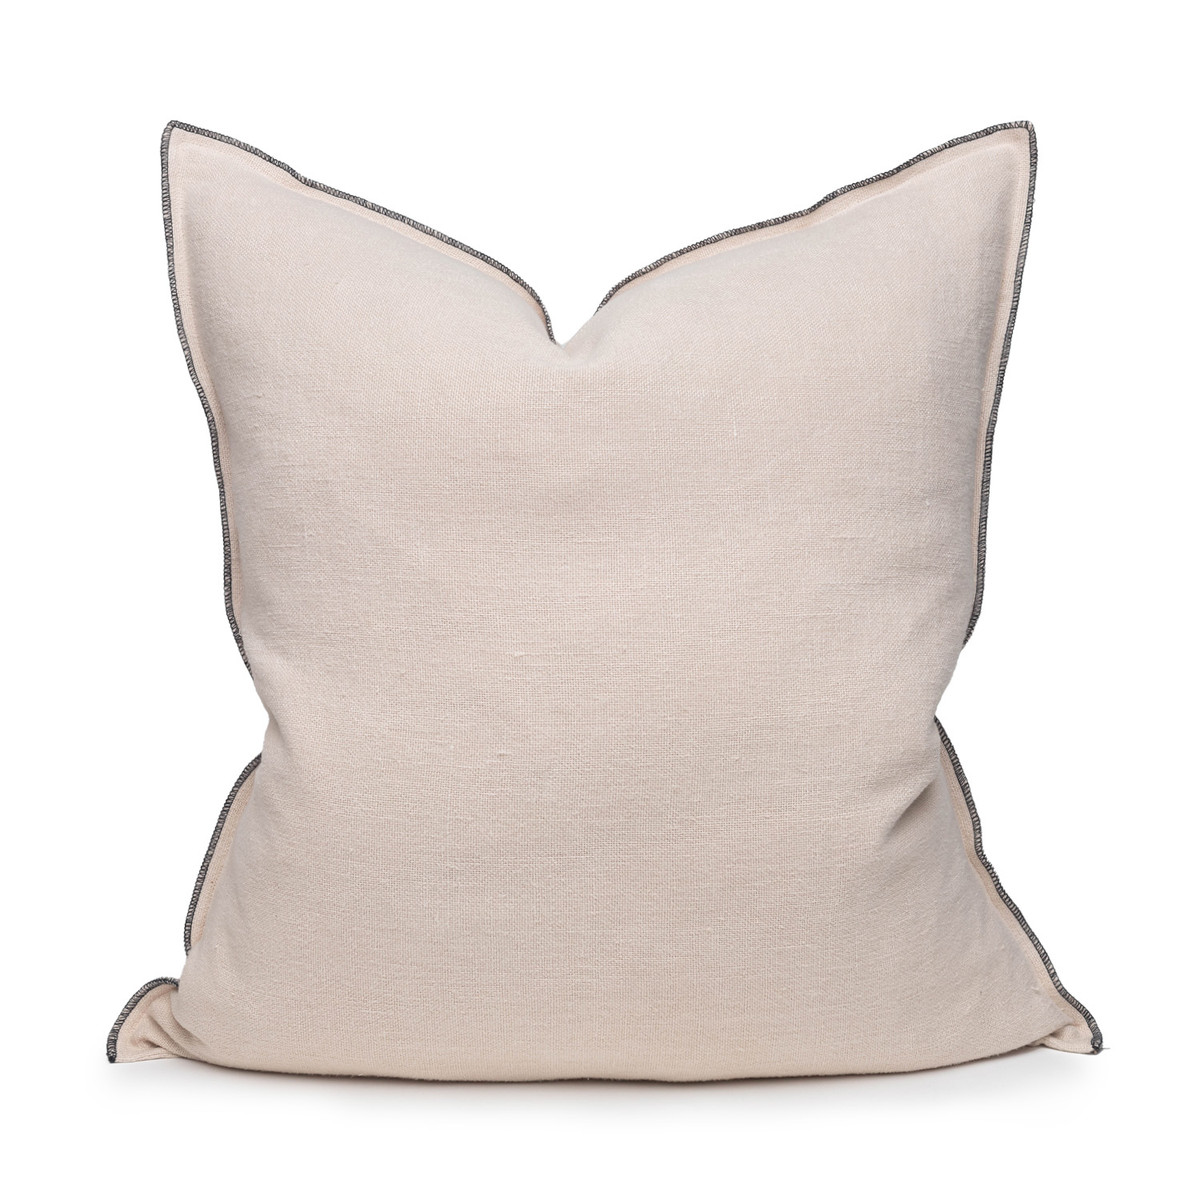 Santal Linen Pillow 22 - Creme Brulee - Front View